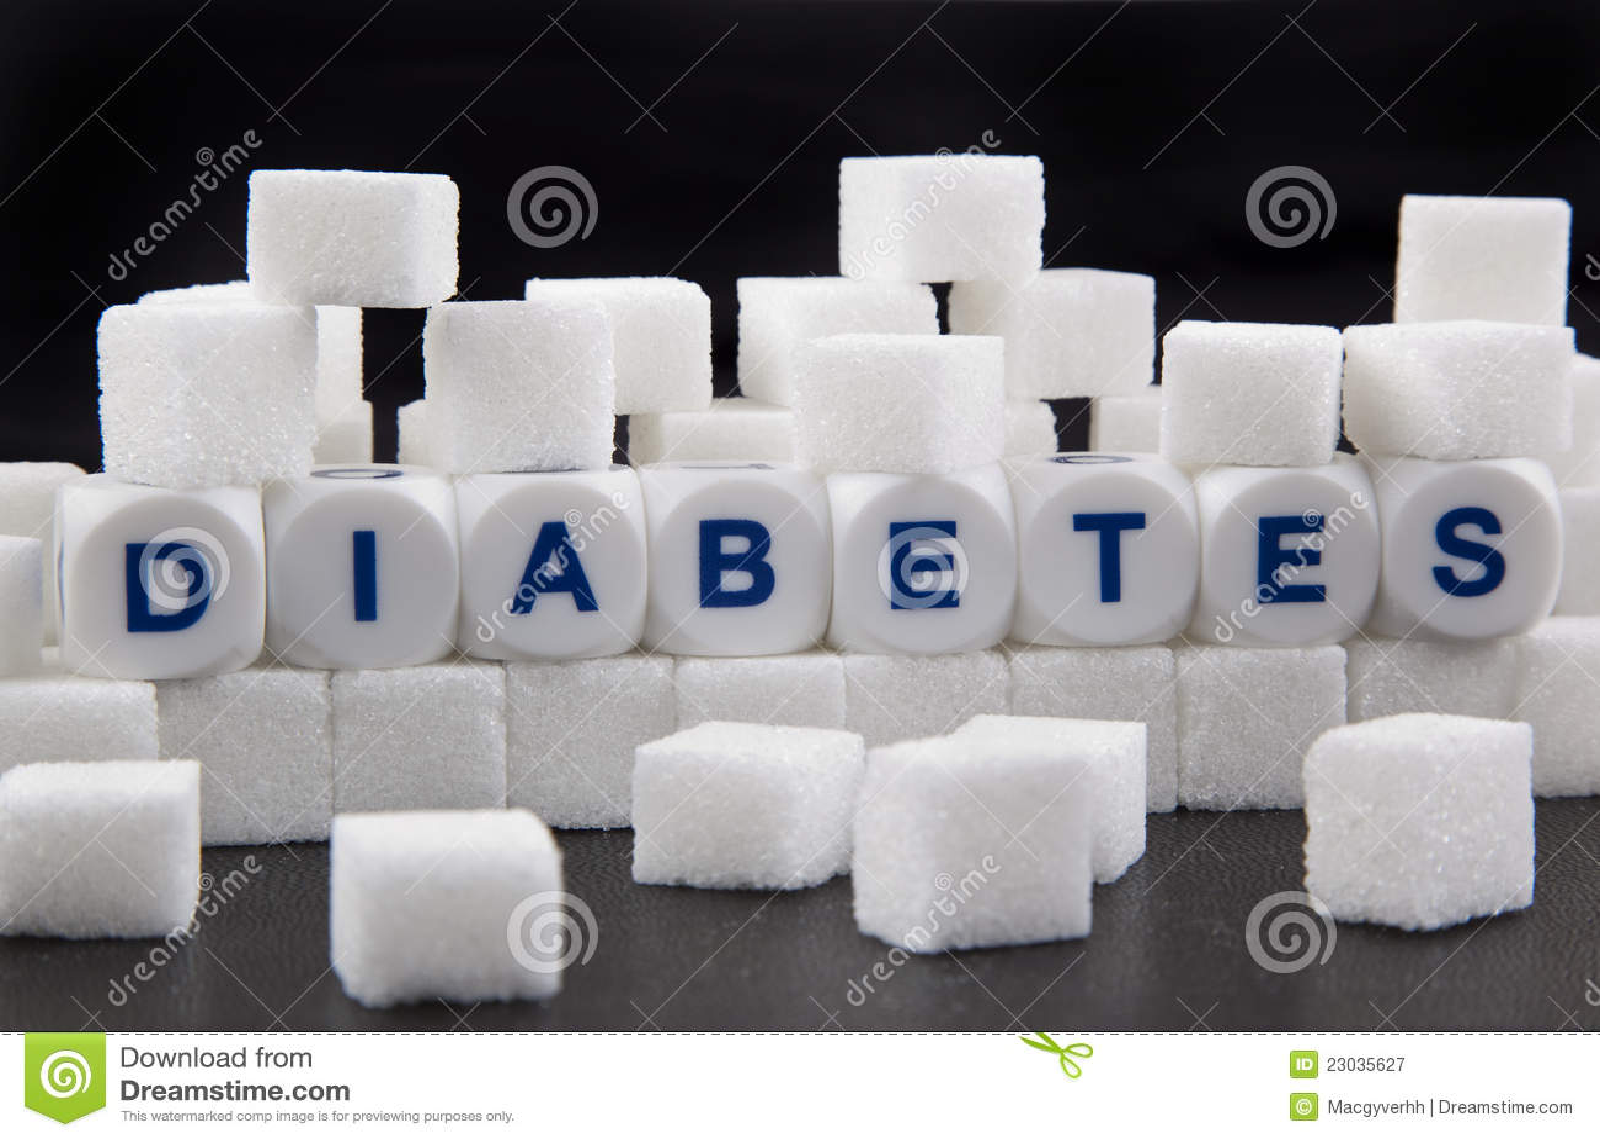 Diabetes Royalty Free Stock Photography Image 23035627